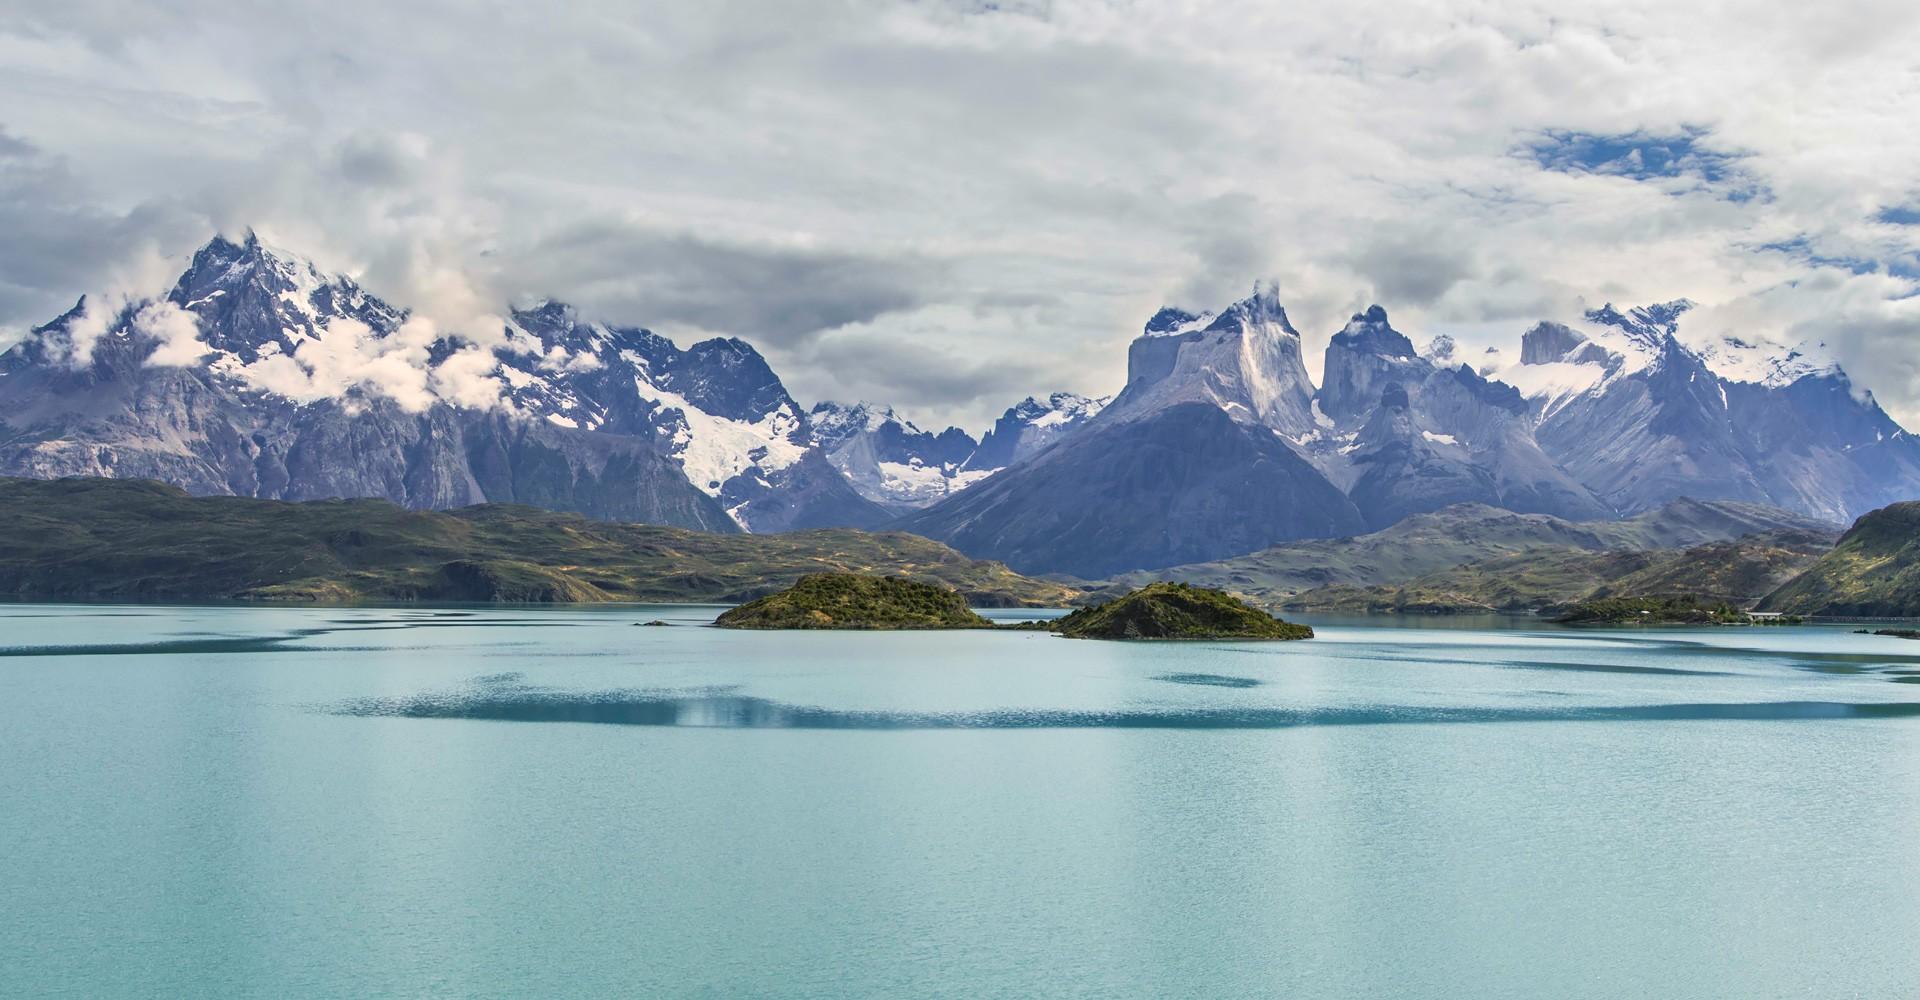 Mountains in Chile Patagonia Tour